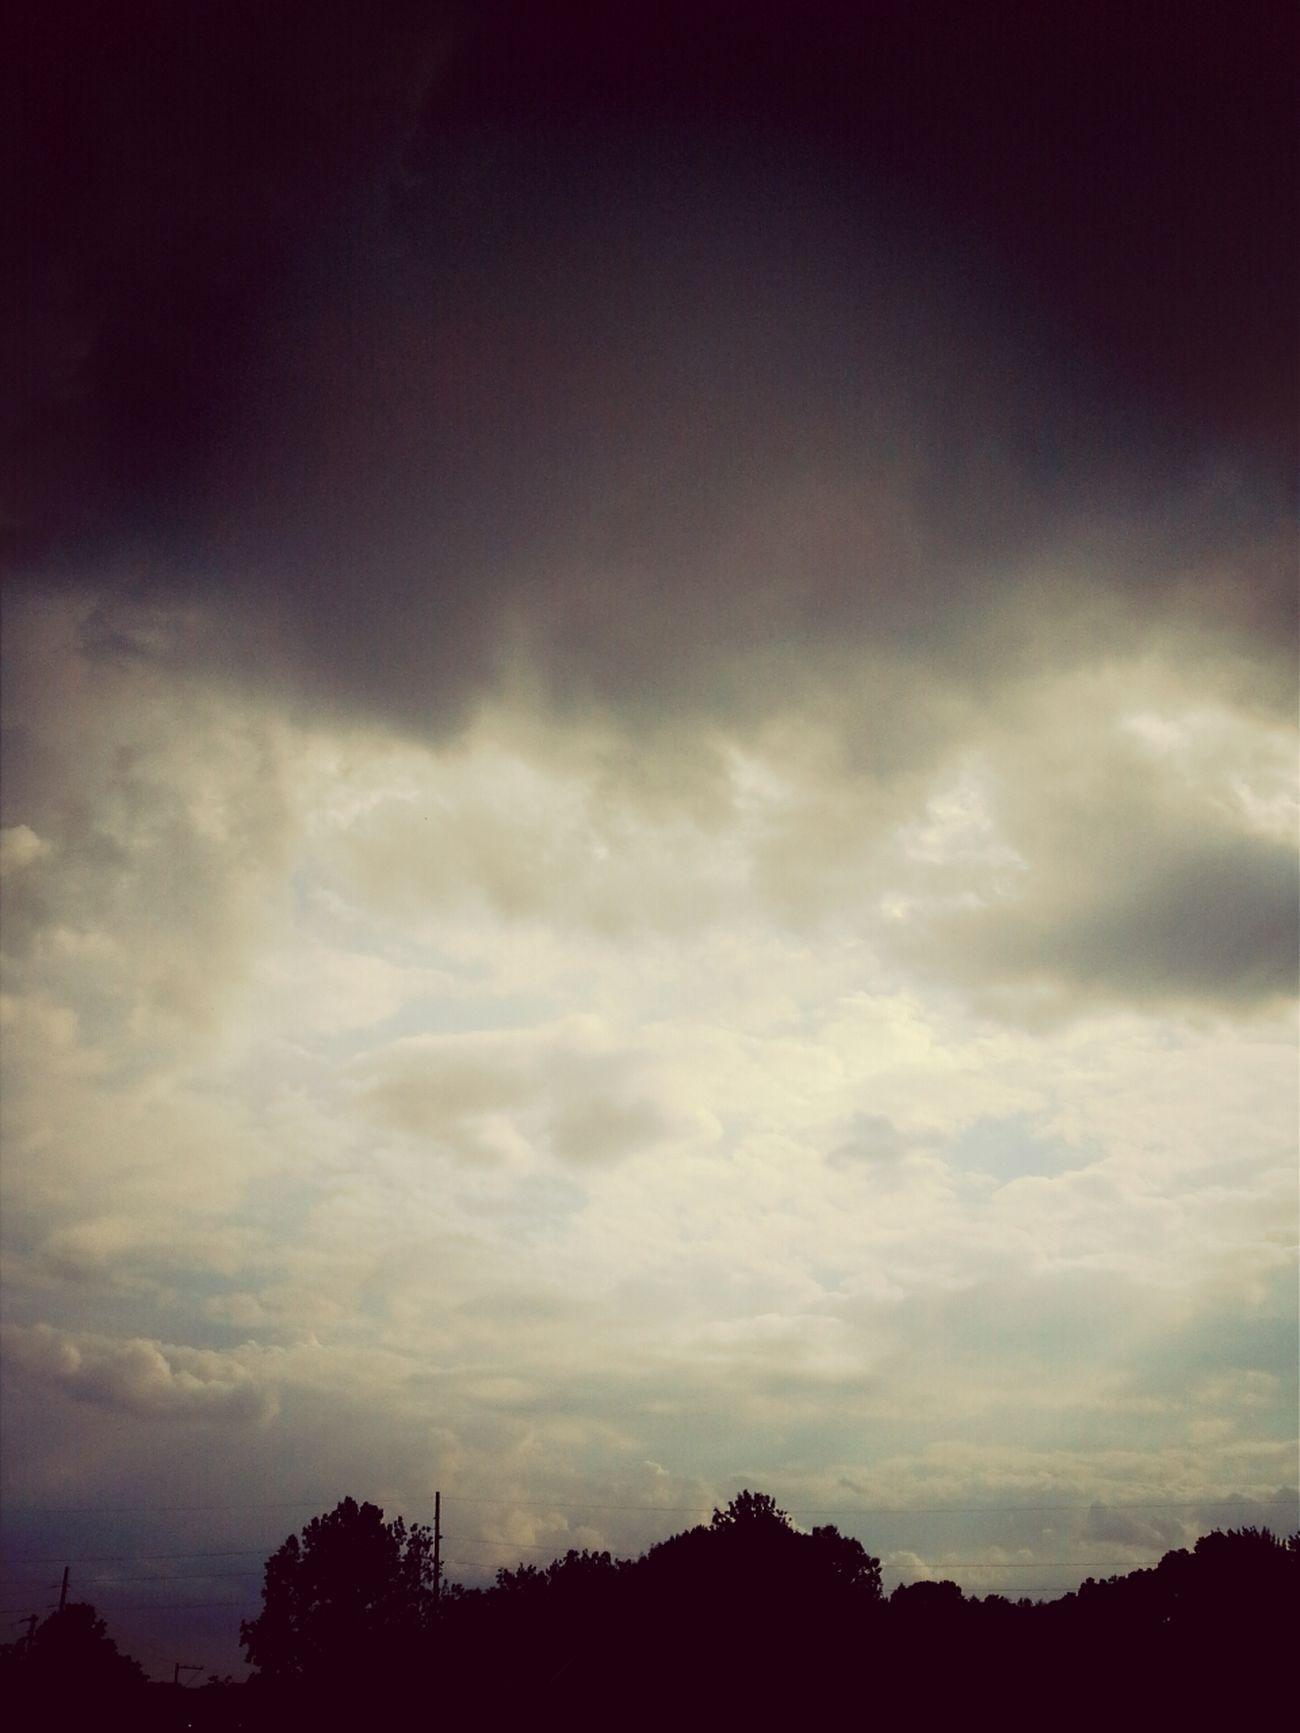 ::;;::;:;:::::;;:its gonna rain::;;:::;;::;;:::;; Rain Sky Stratis Storm